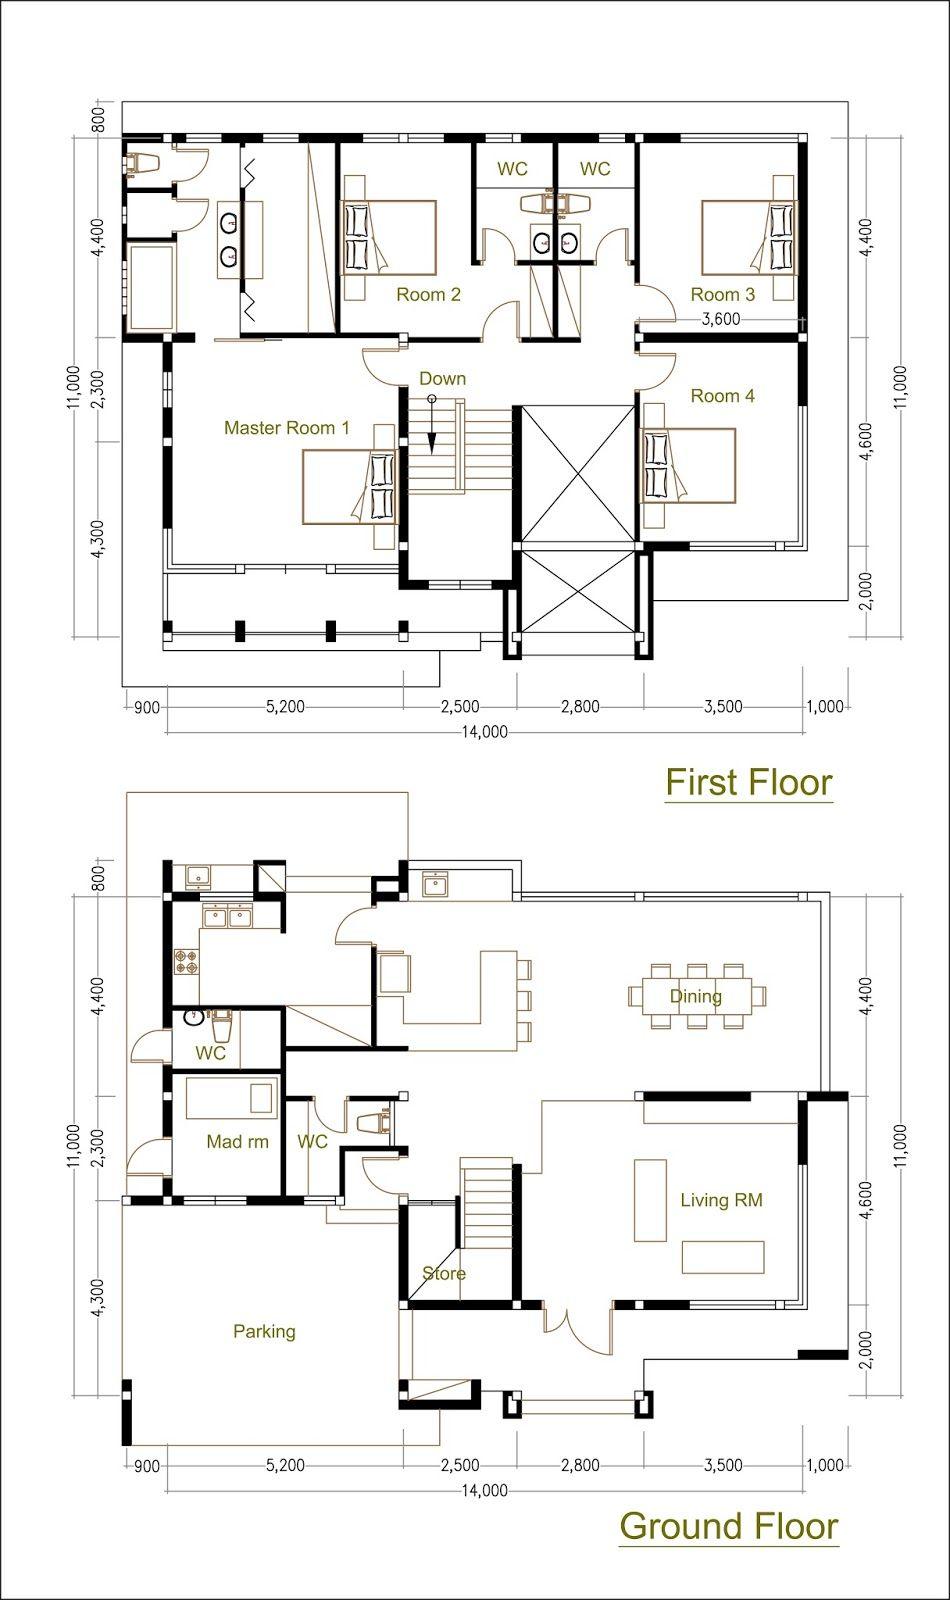 4 Bedrooms Home Design Plan Size 14x11m Samphoas Plan Home Design Plan Home Design Floor Plans How To Plan